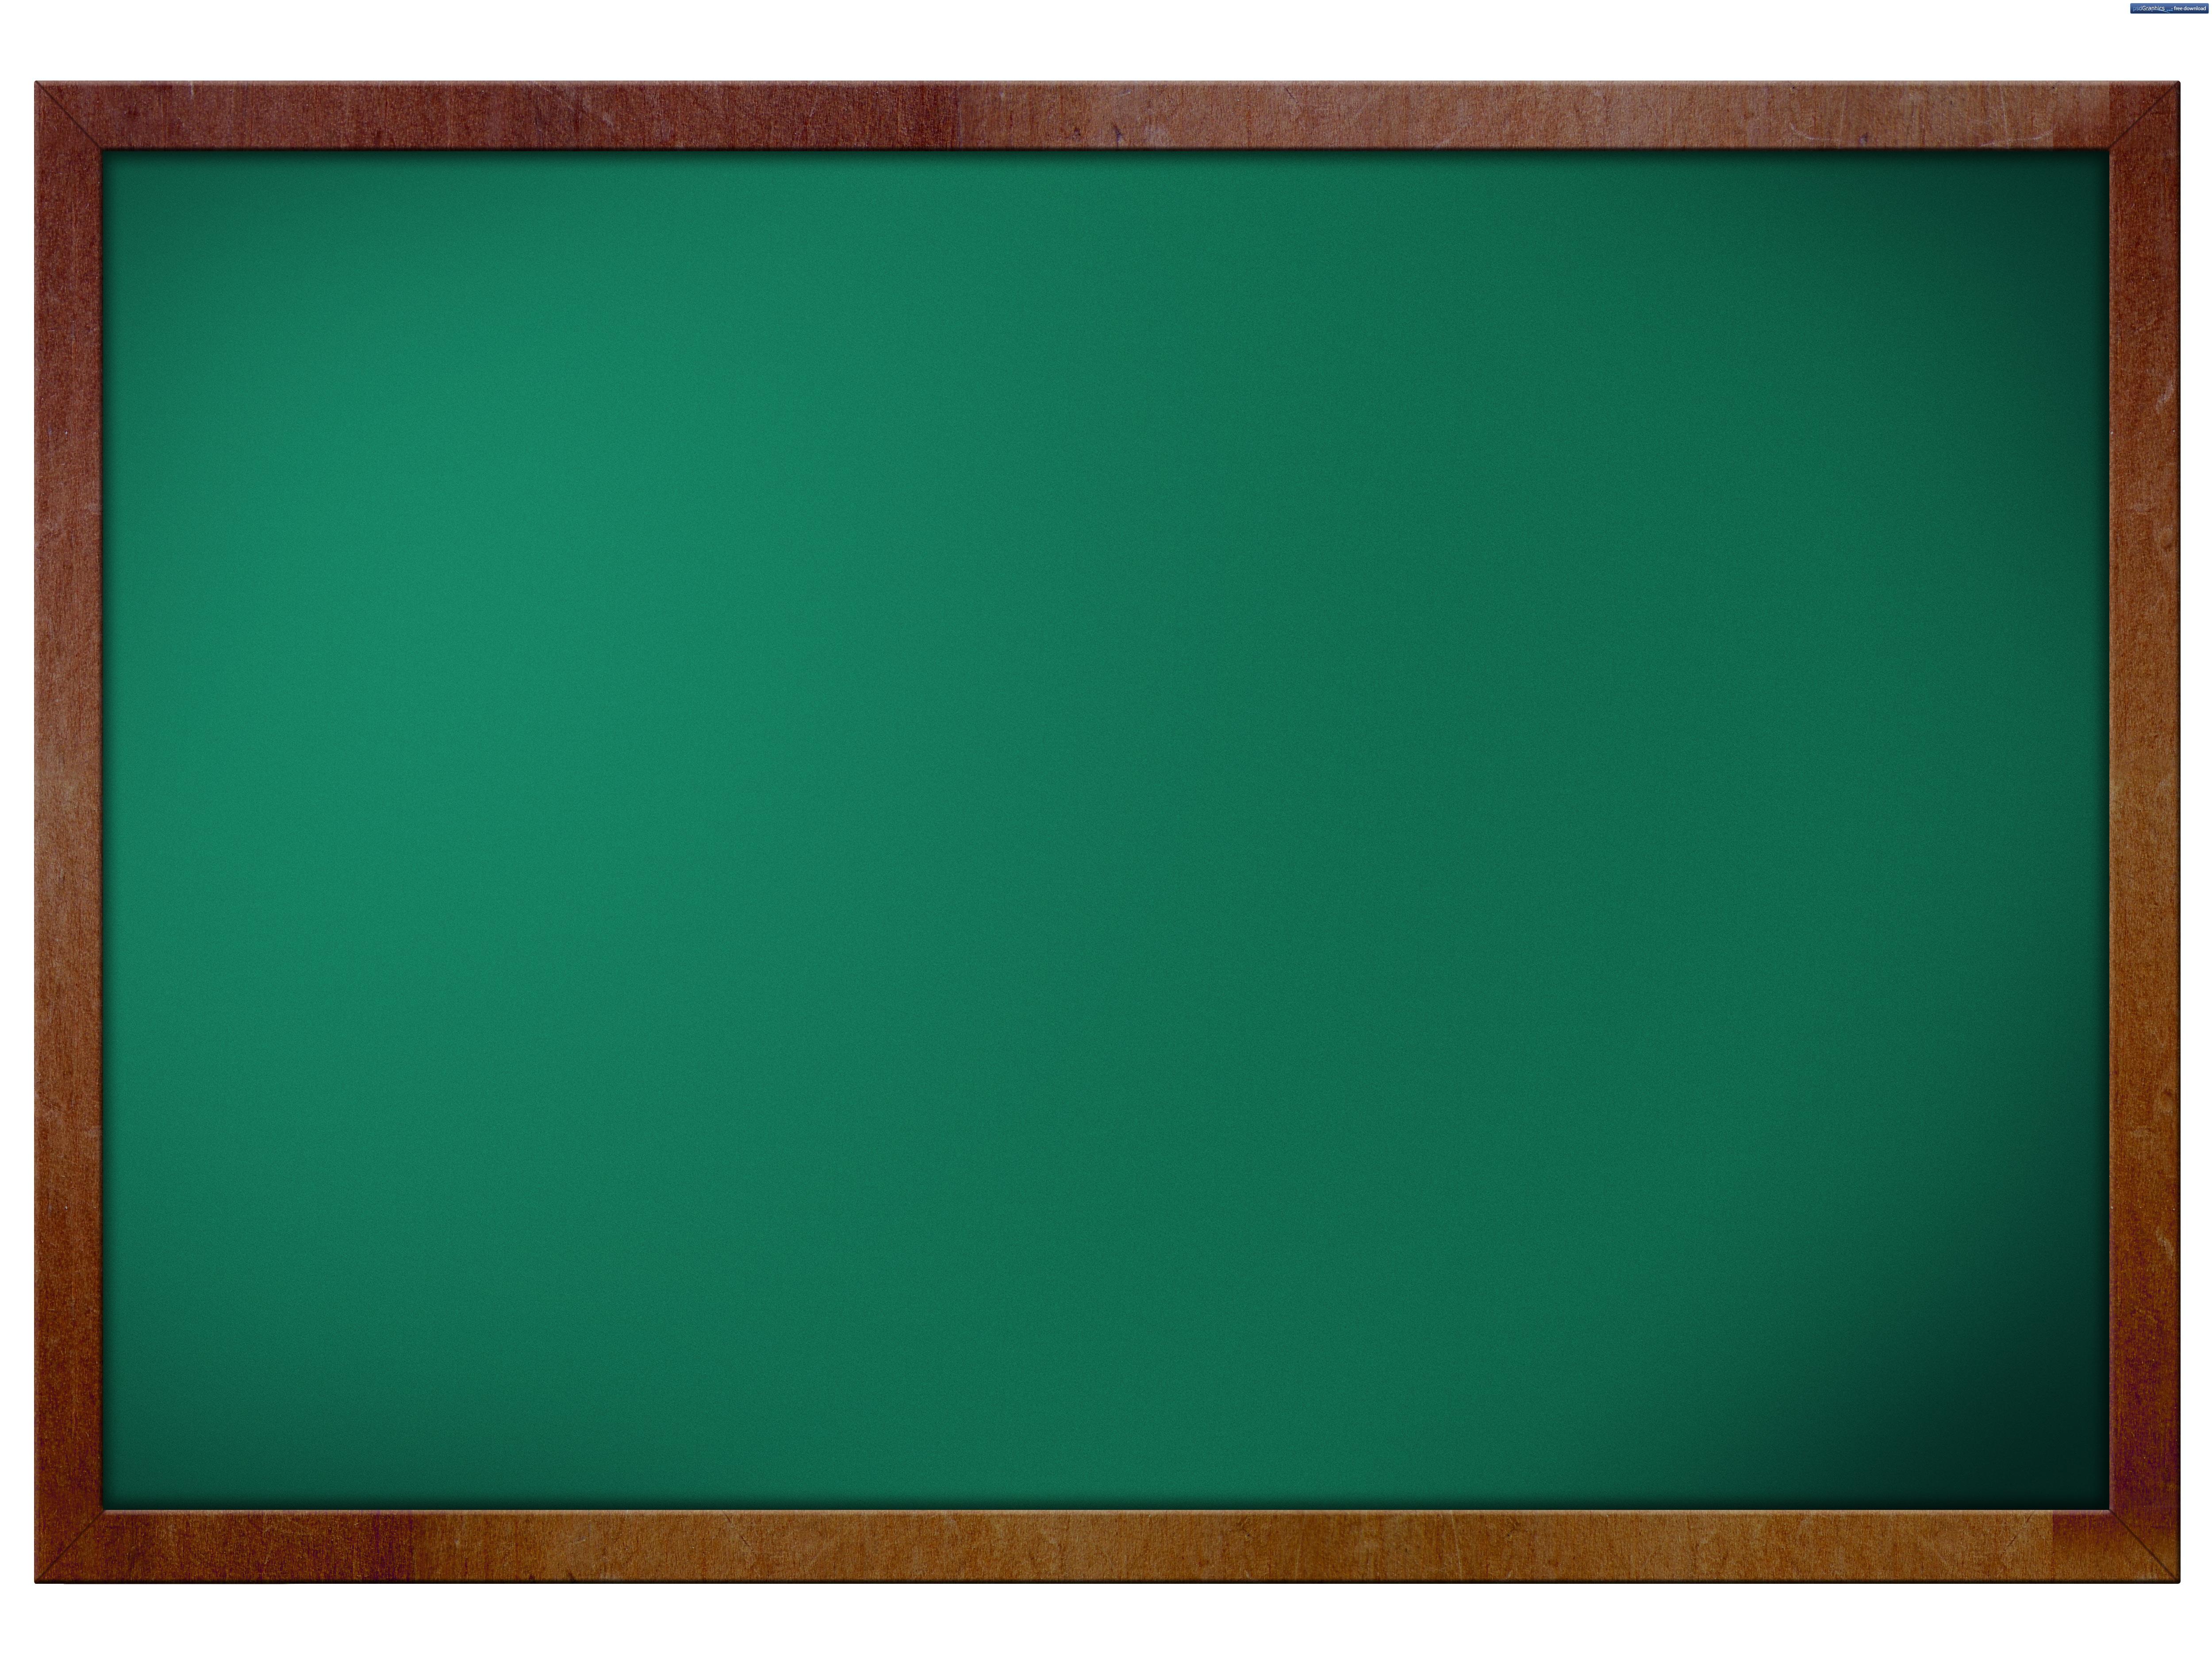 Blank Chalkboard Clipart - Clipart Suggest